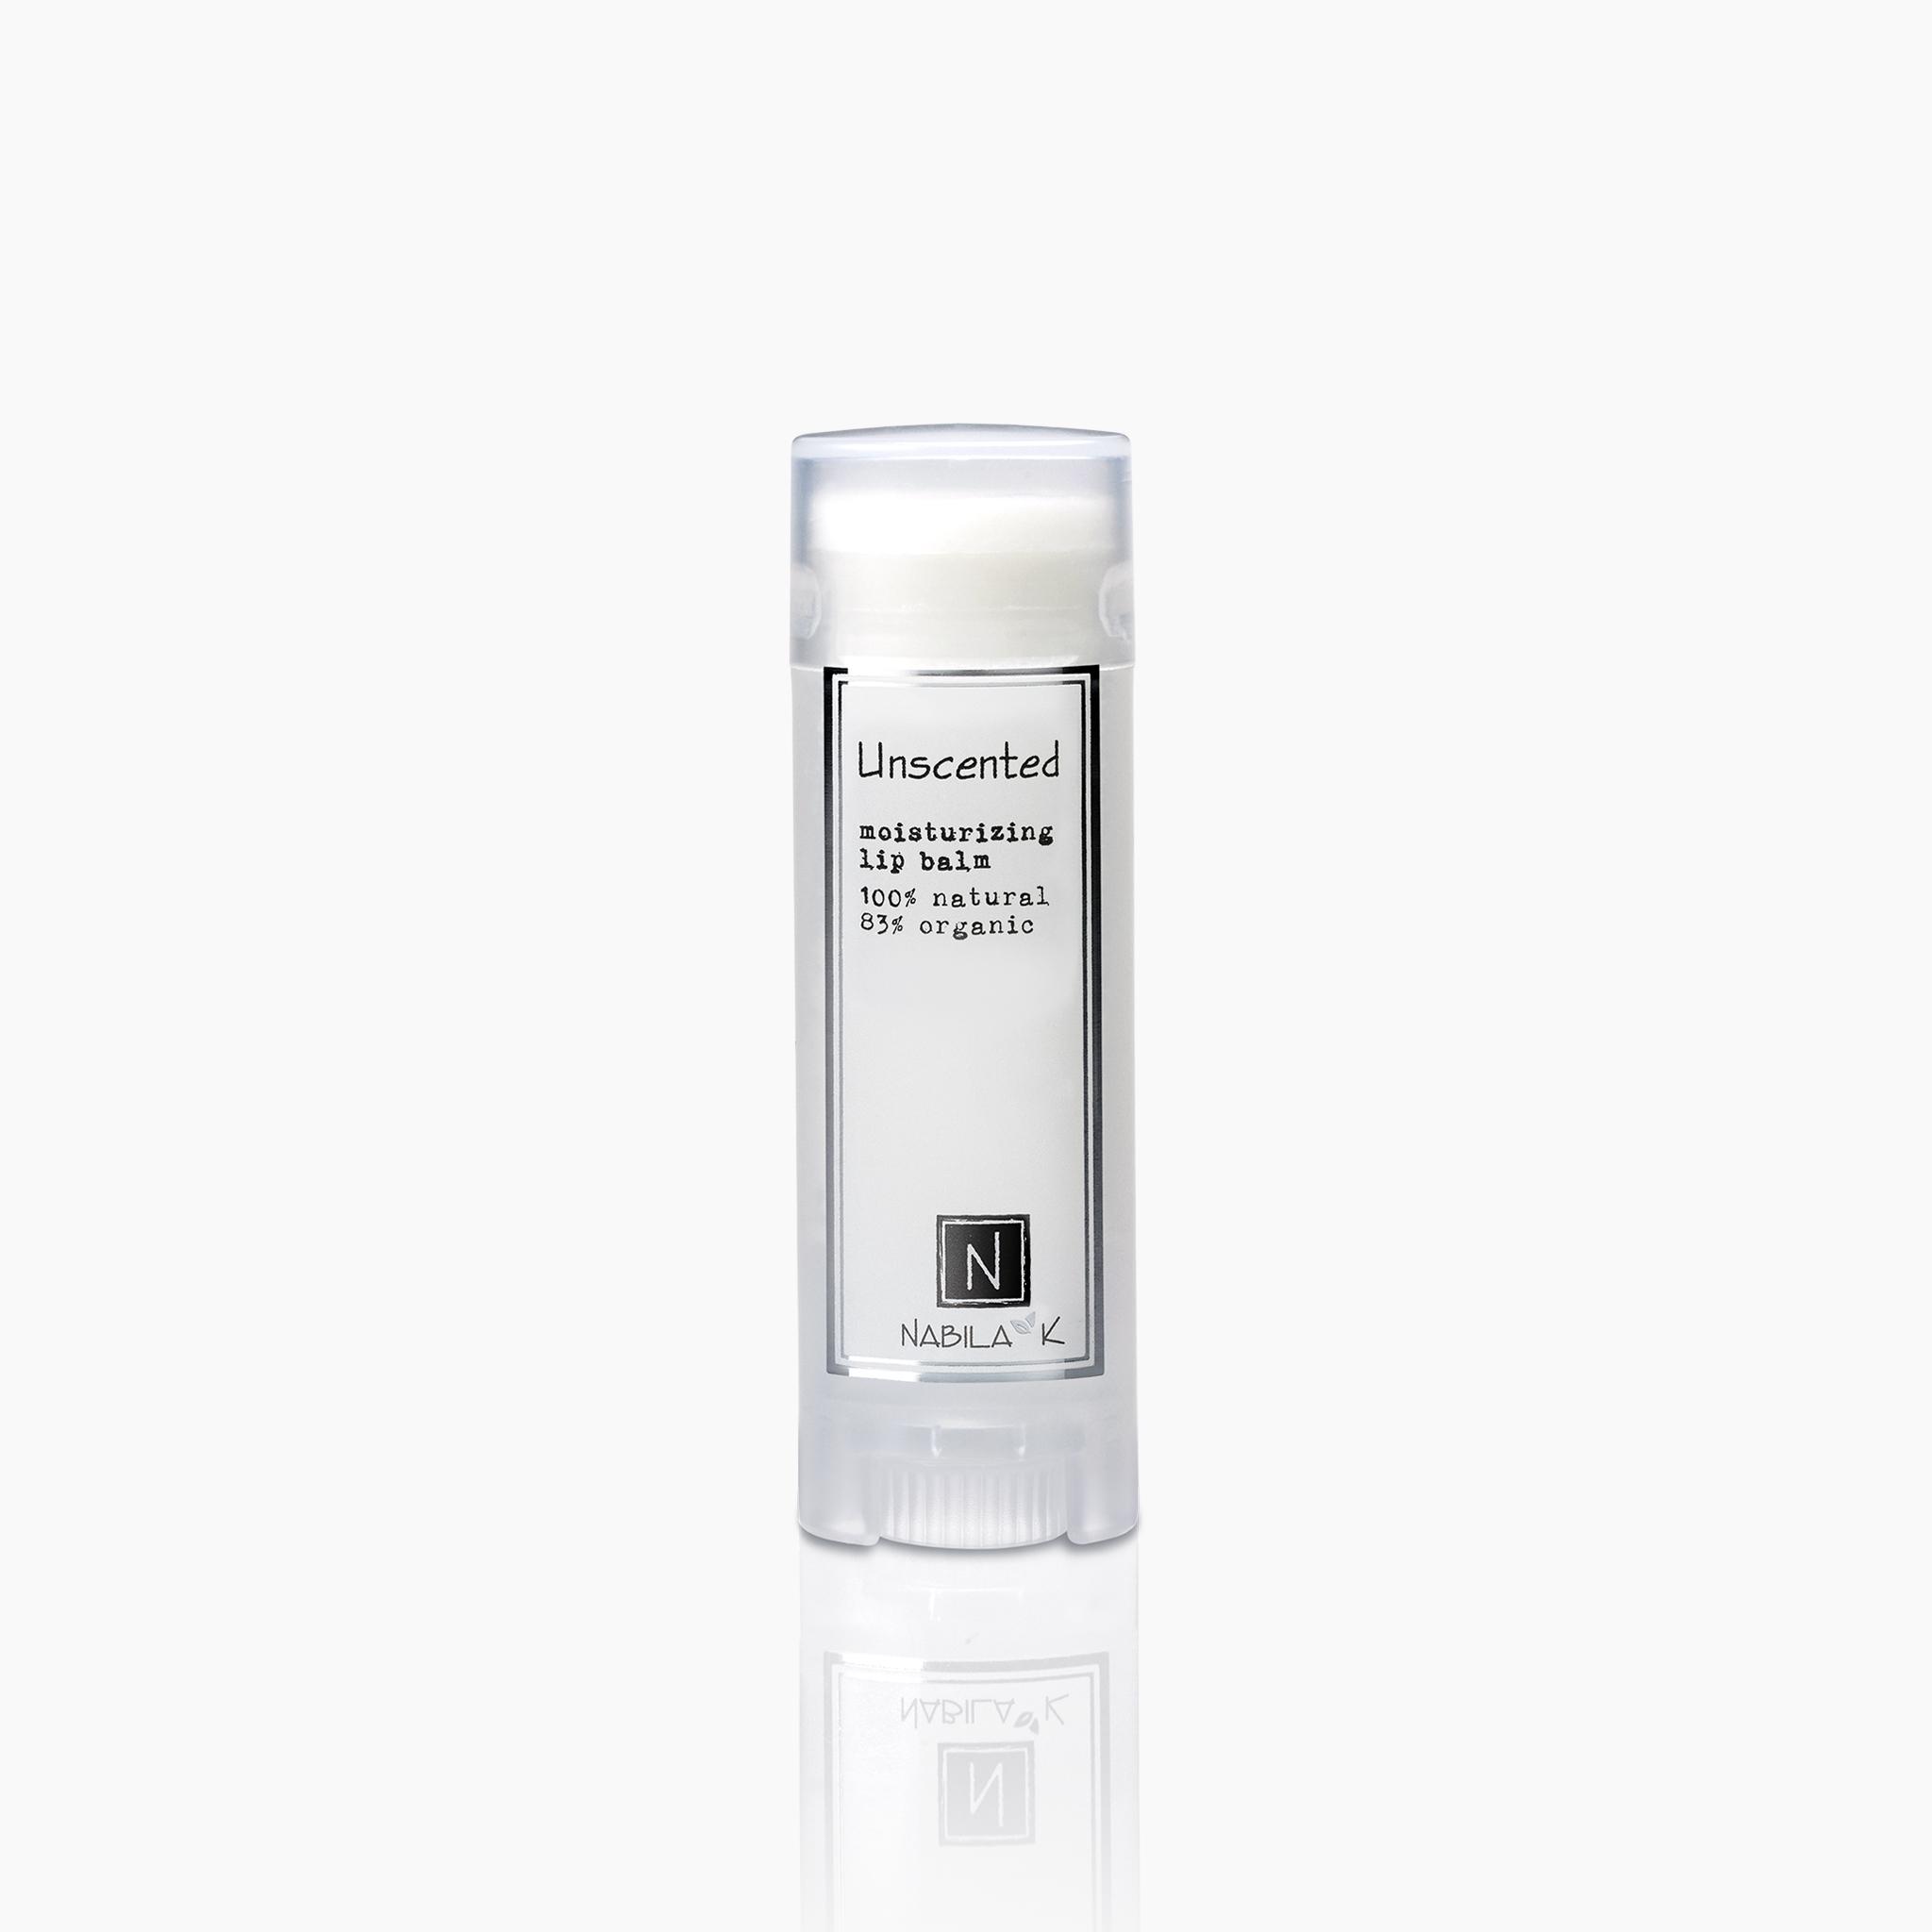 Unscented moisturizing lip balm 100% natural 85% organic